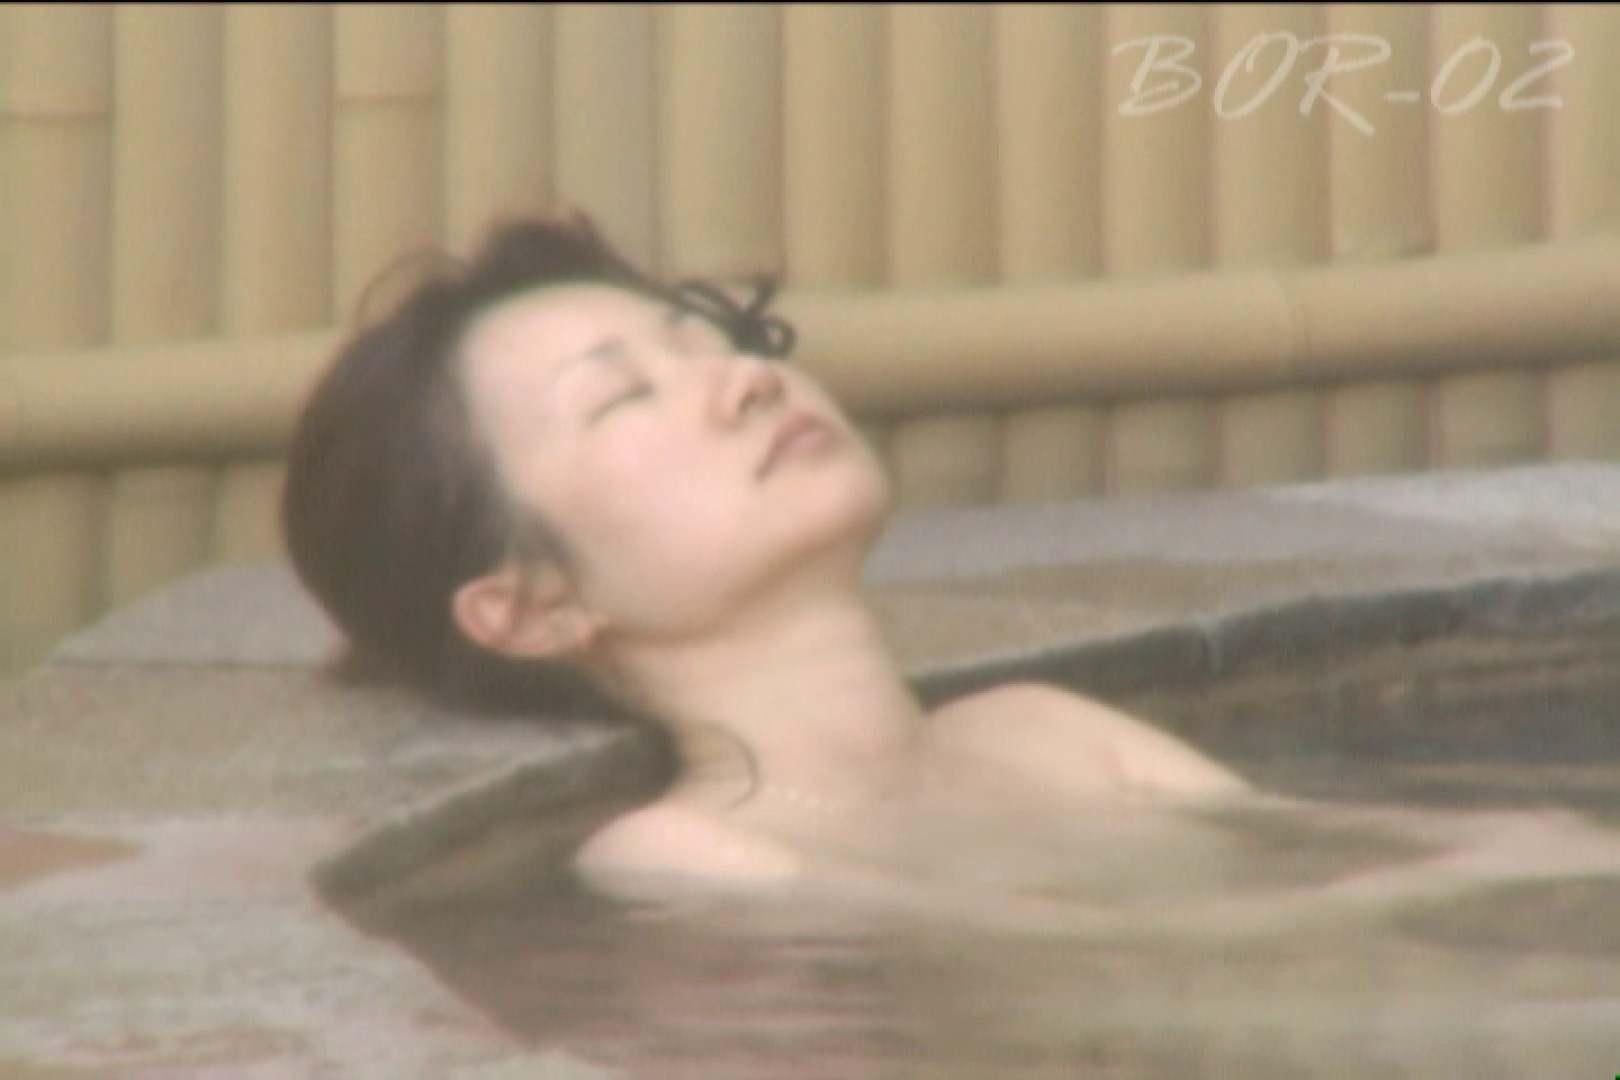 Aquaな露天風呂Vol.477 盗撮シリーズ | 露天風呂編  104PIX 47